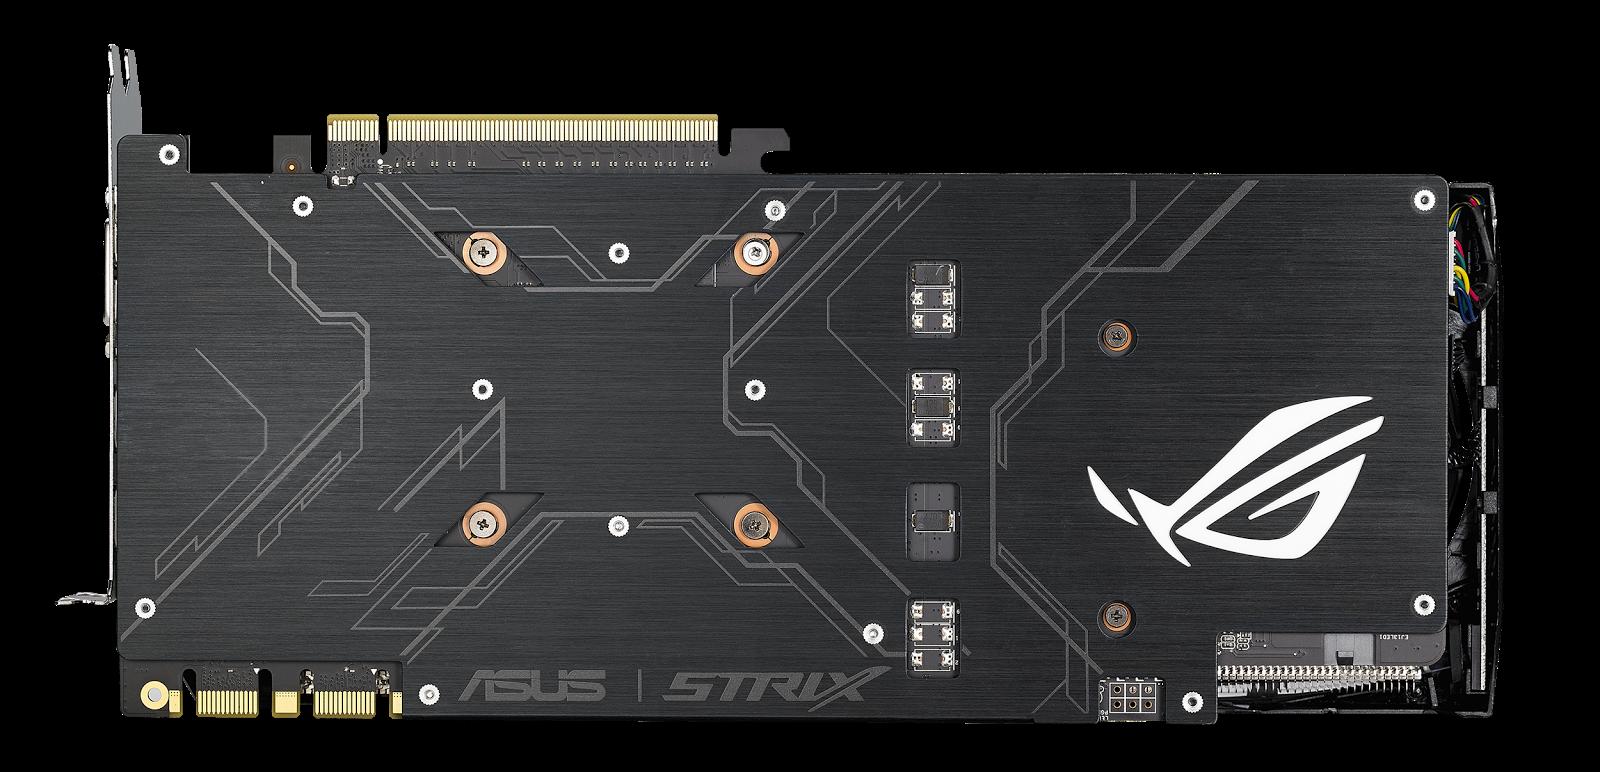 ASUS Unveiled Its ROG-STRIX GeForce GTX 1070 Ti 6